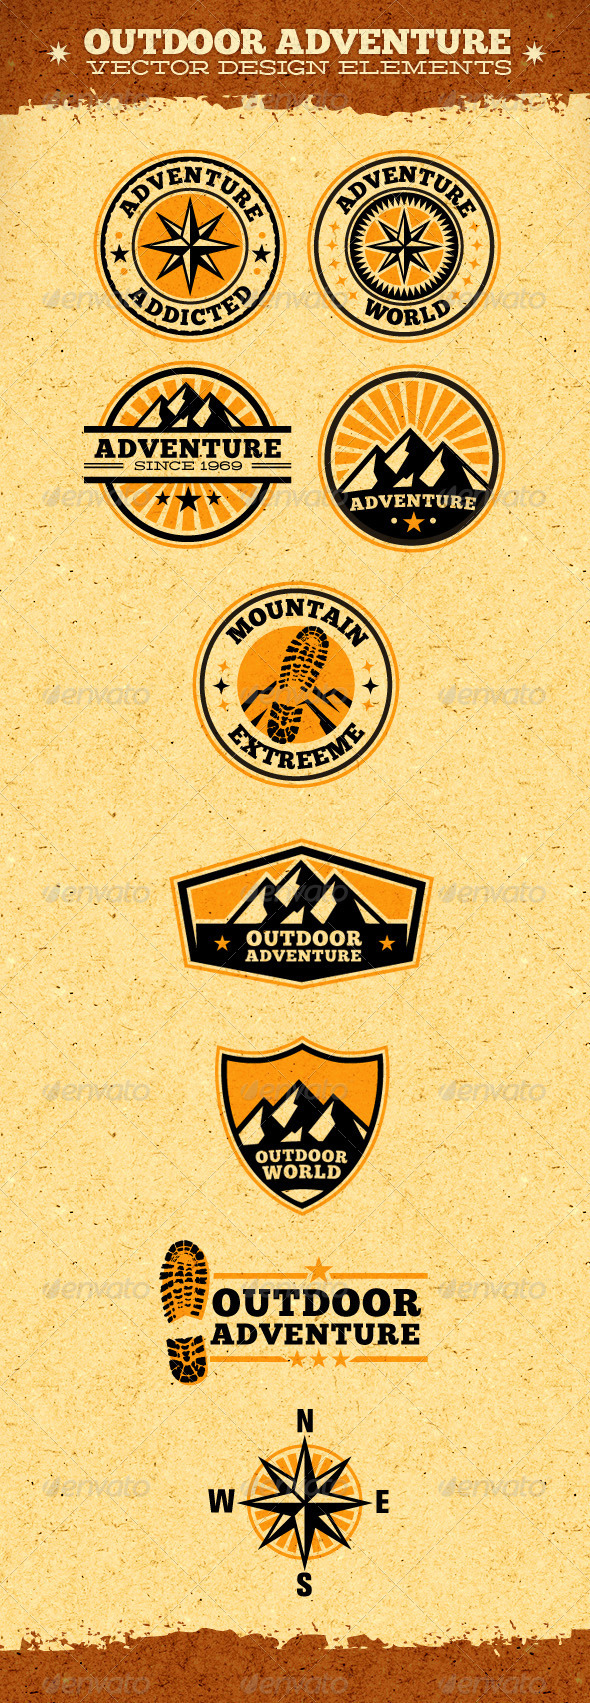 GraphicRiver Outdoor Adventure Vector Design Elements 1873825